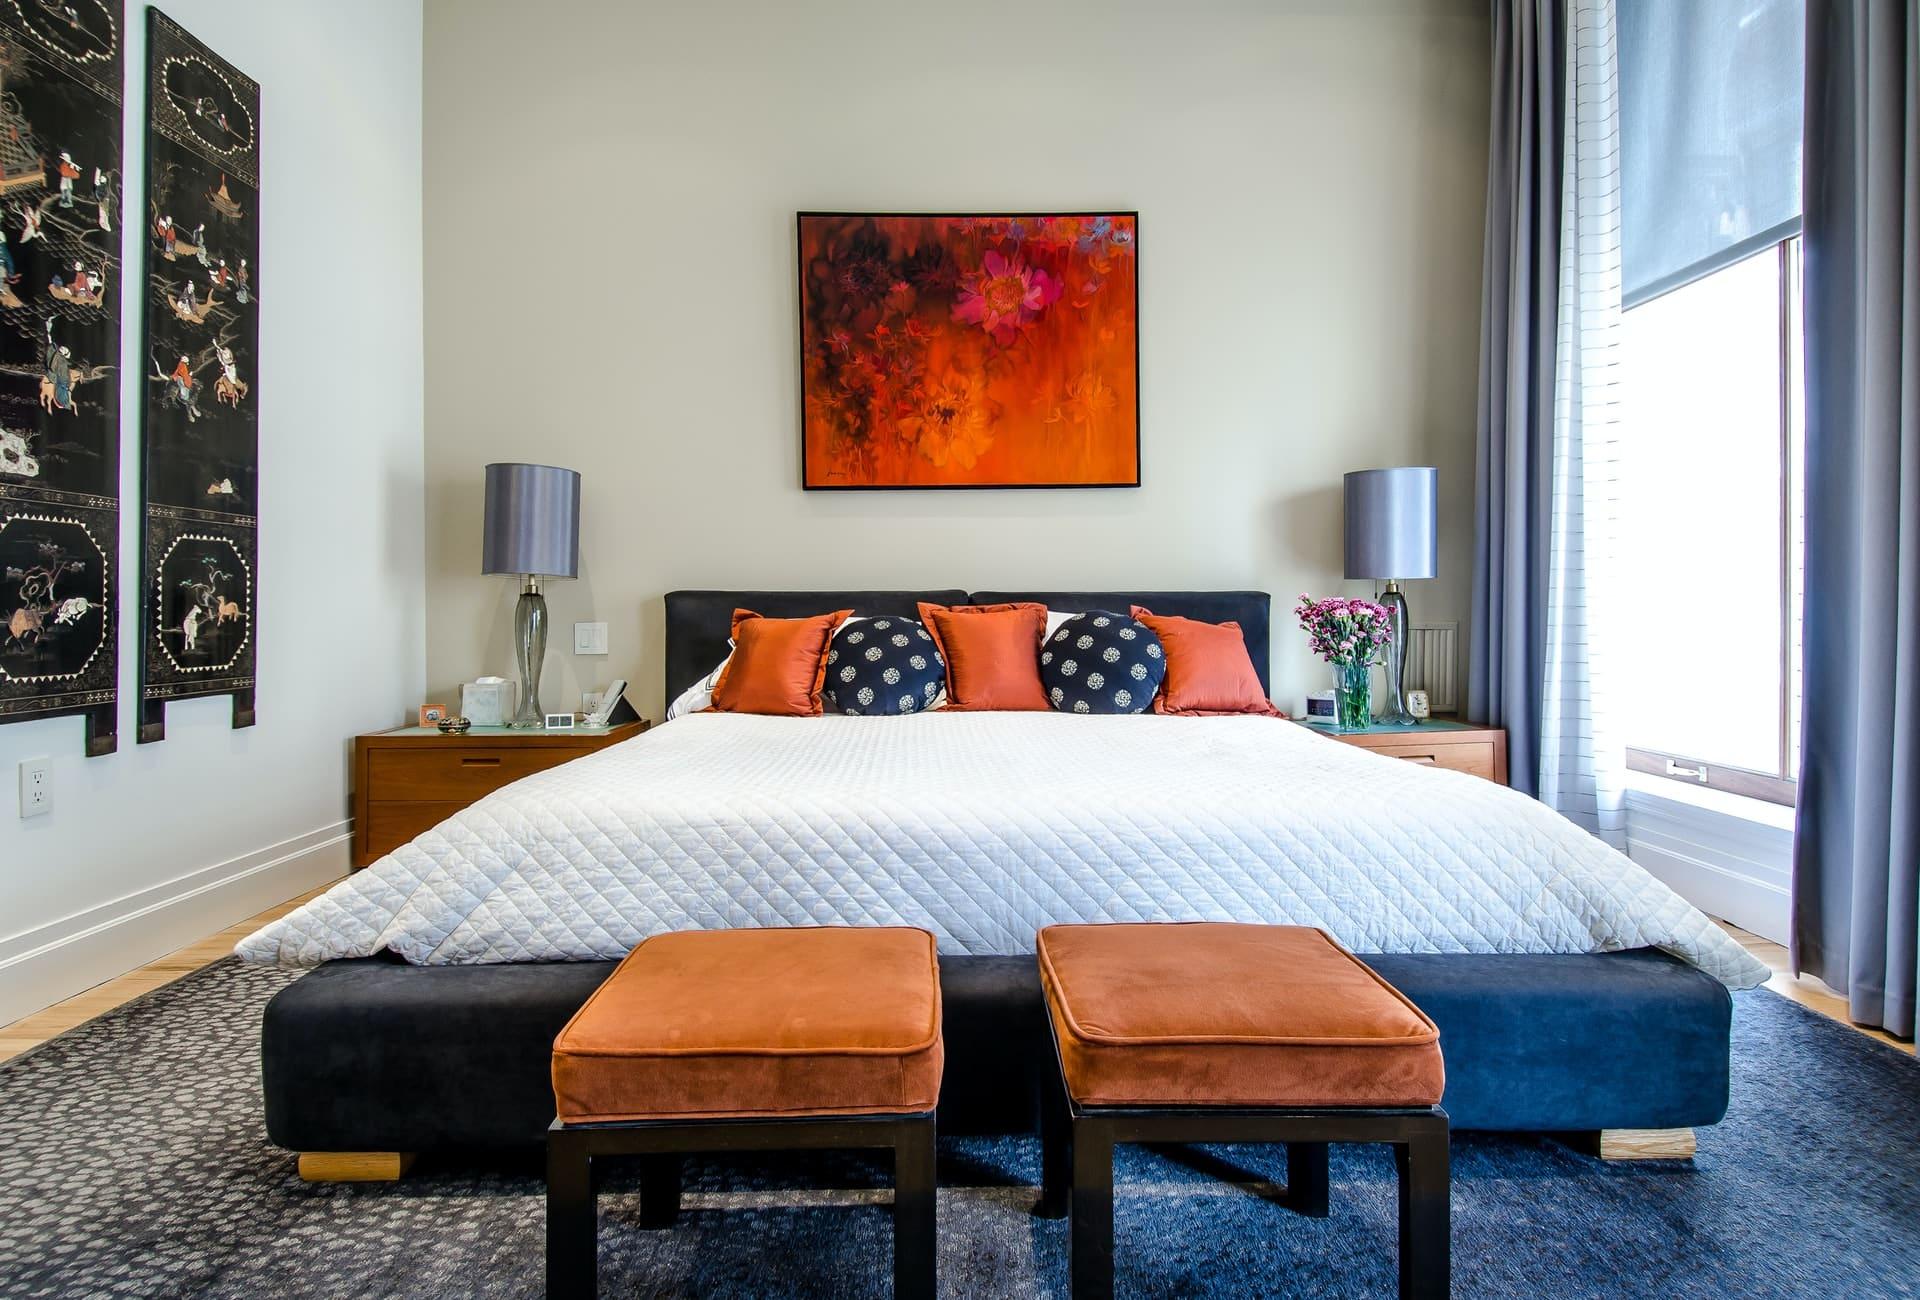 Bedroom Interior Design Tips Header Image